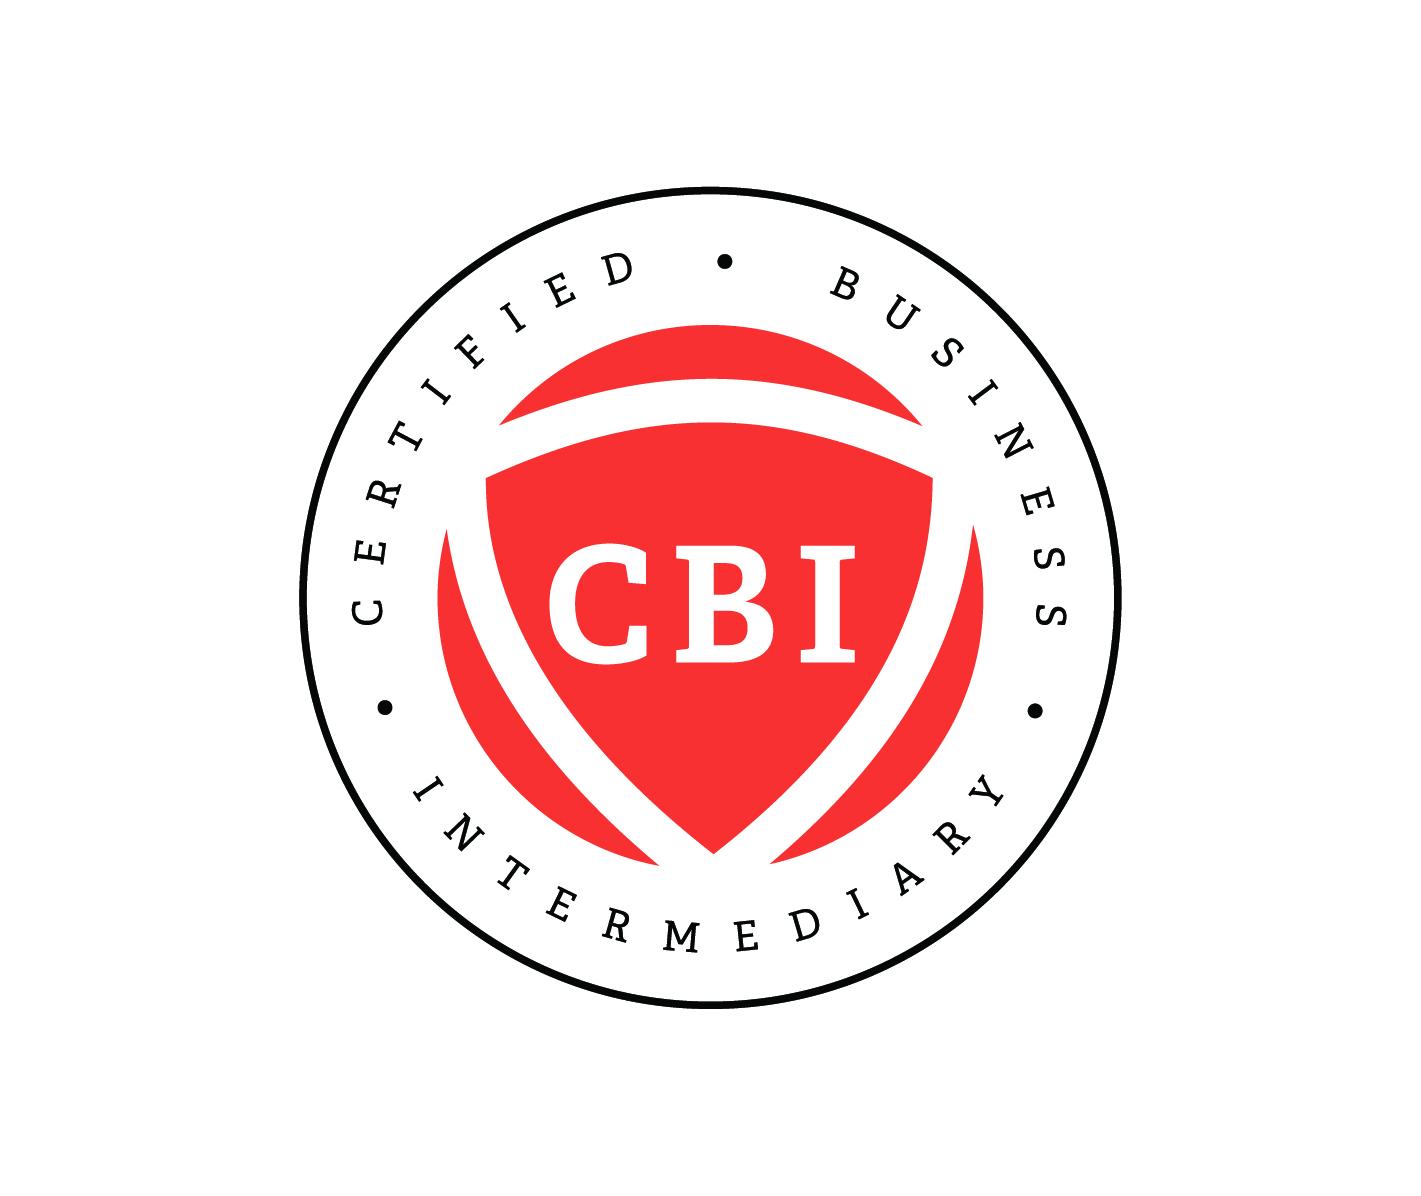 Cbi_logo_color